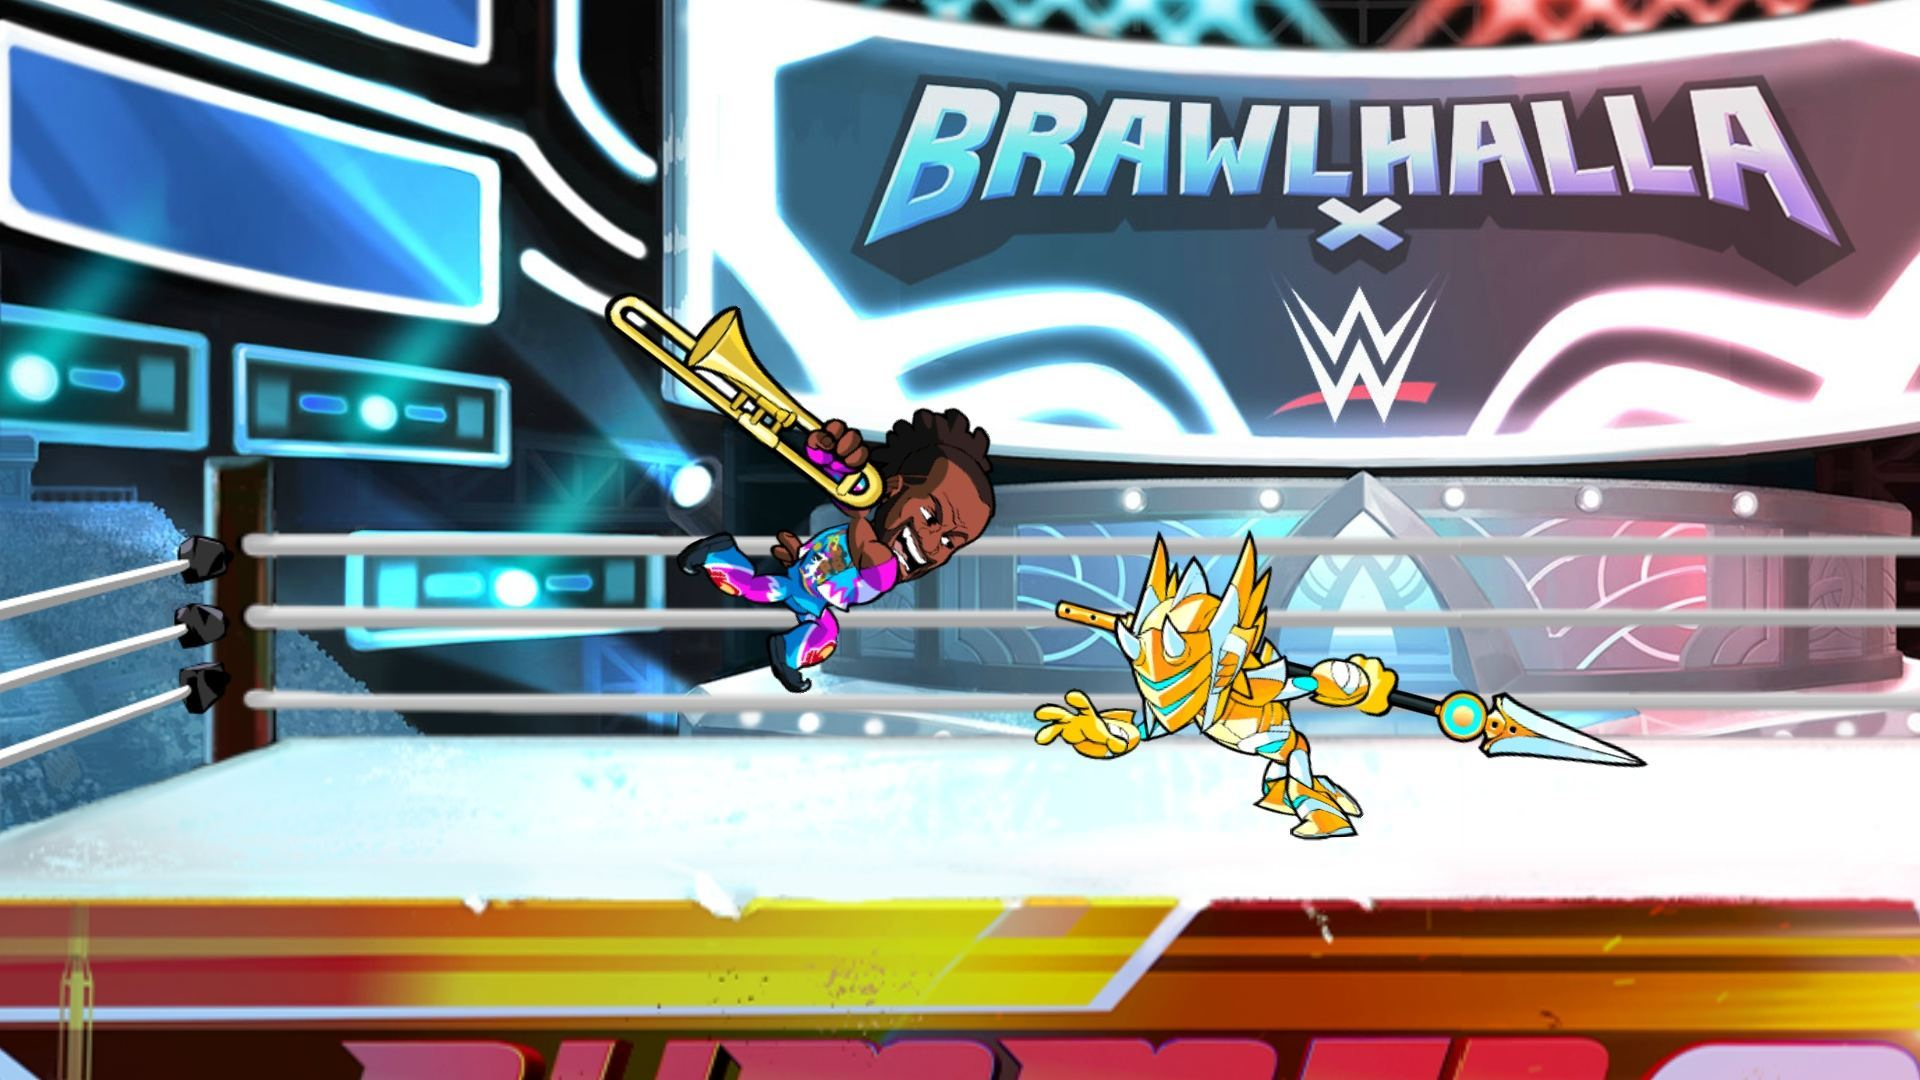 Brawlhalla WWE Event – XAVIER_WOODS_1